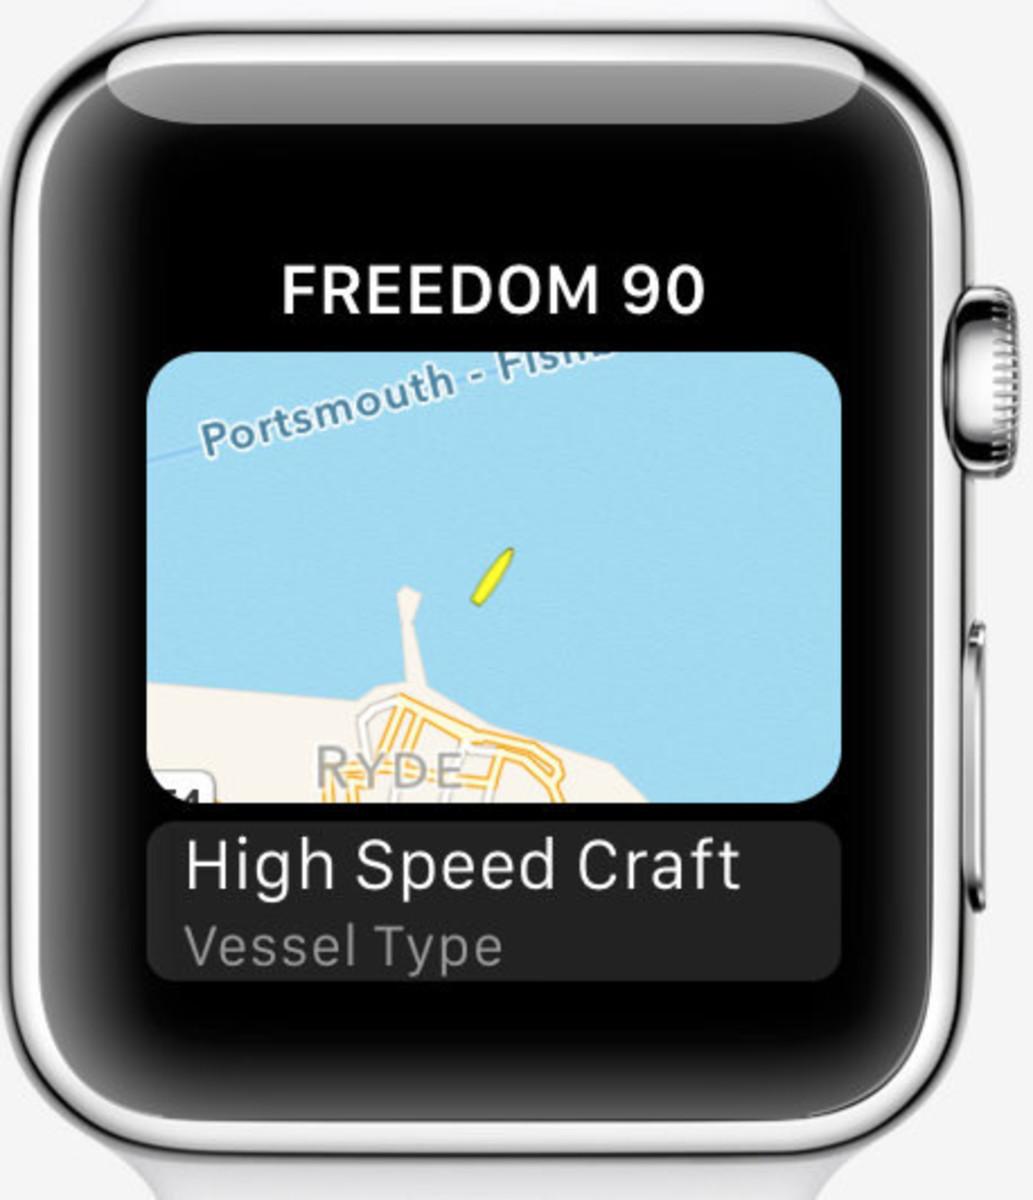 Pocket_Mariner_Boat_Watch_on_Apple_Watch_aPanbo.jpg